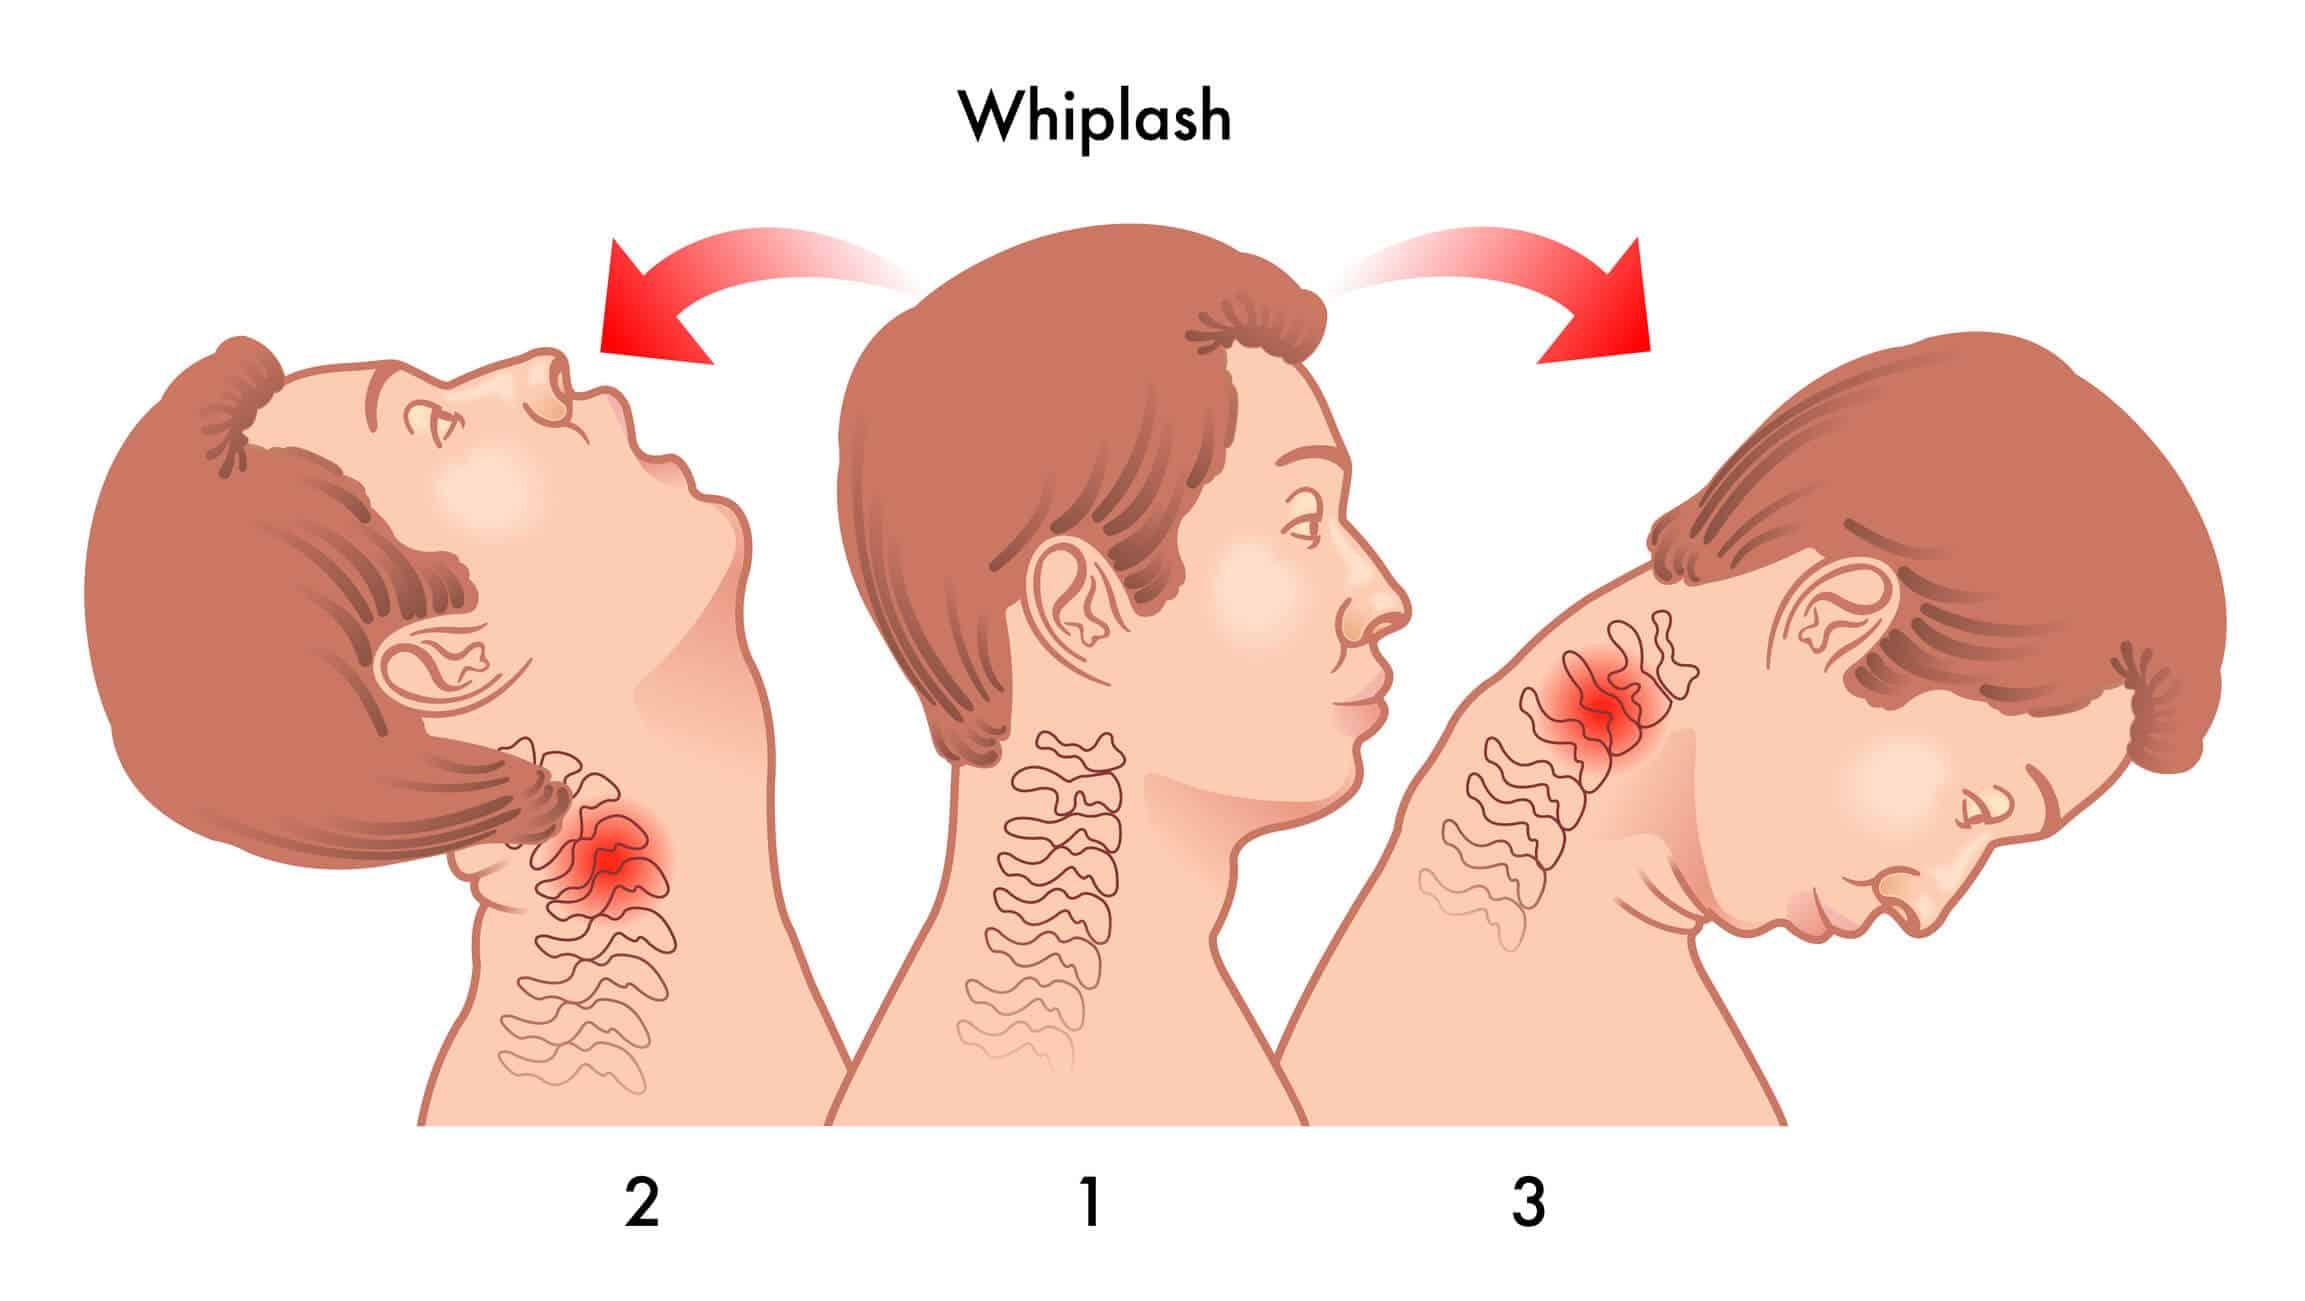 Whiplash